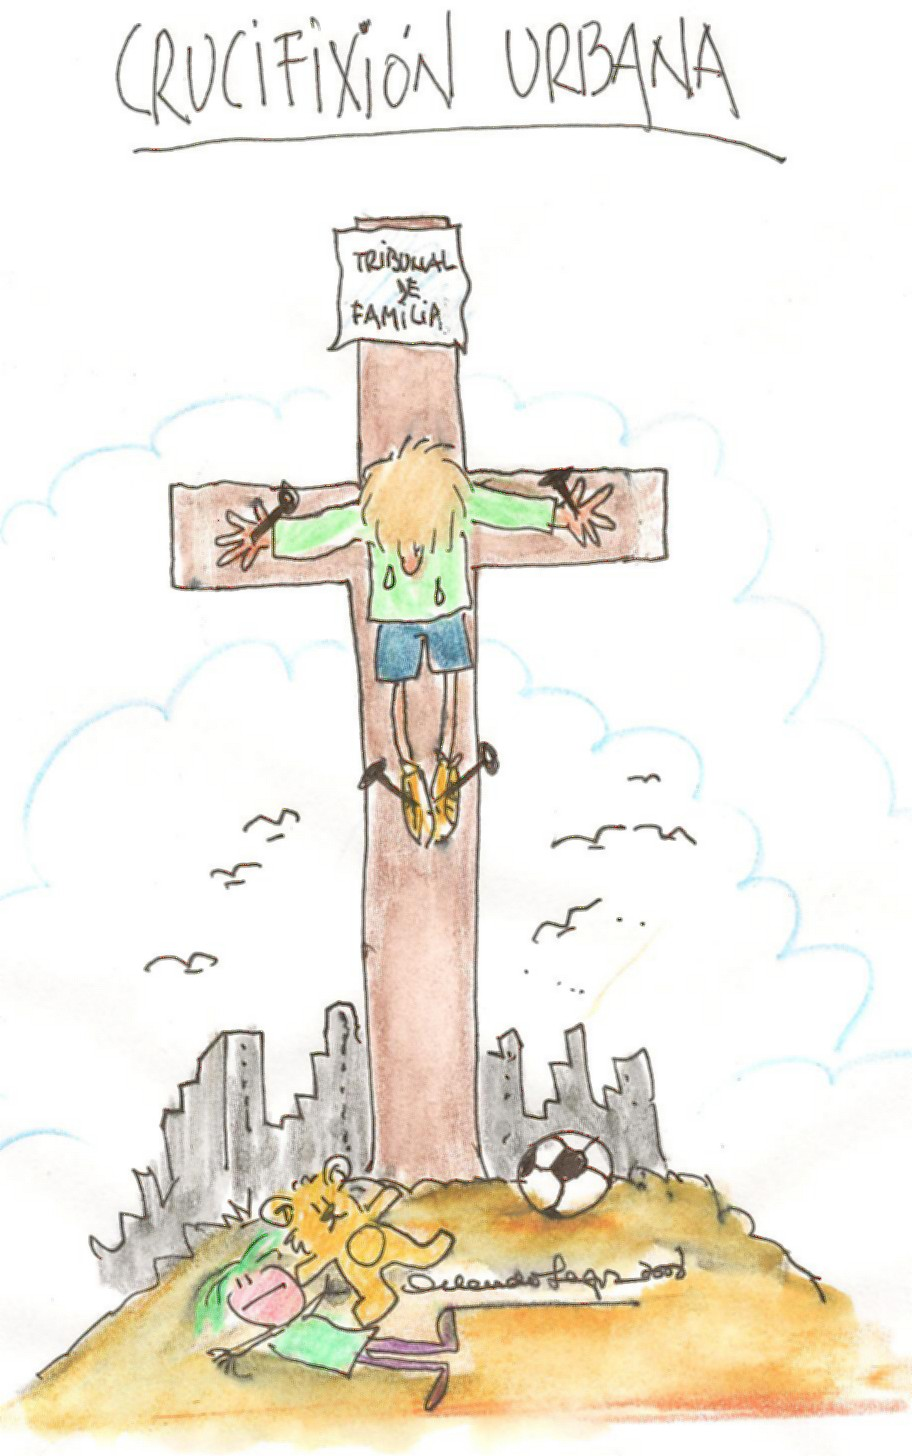 2008-09-05_Crucifixion